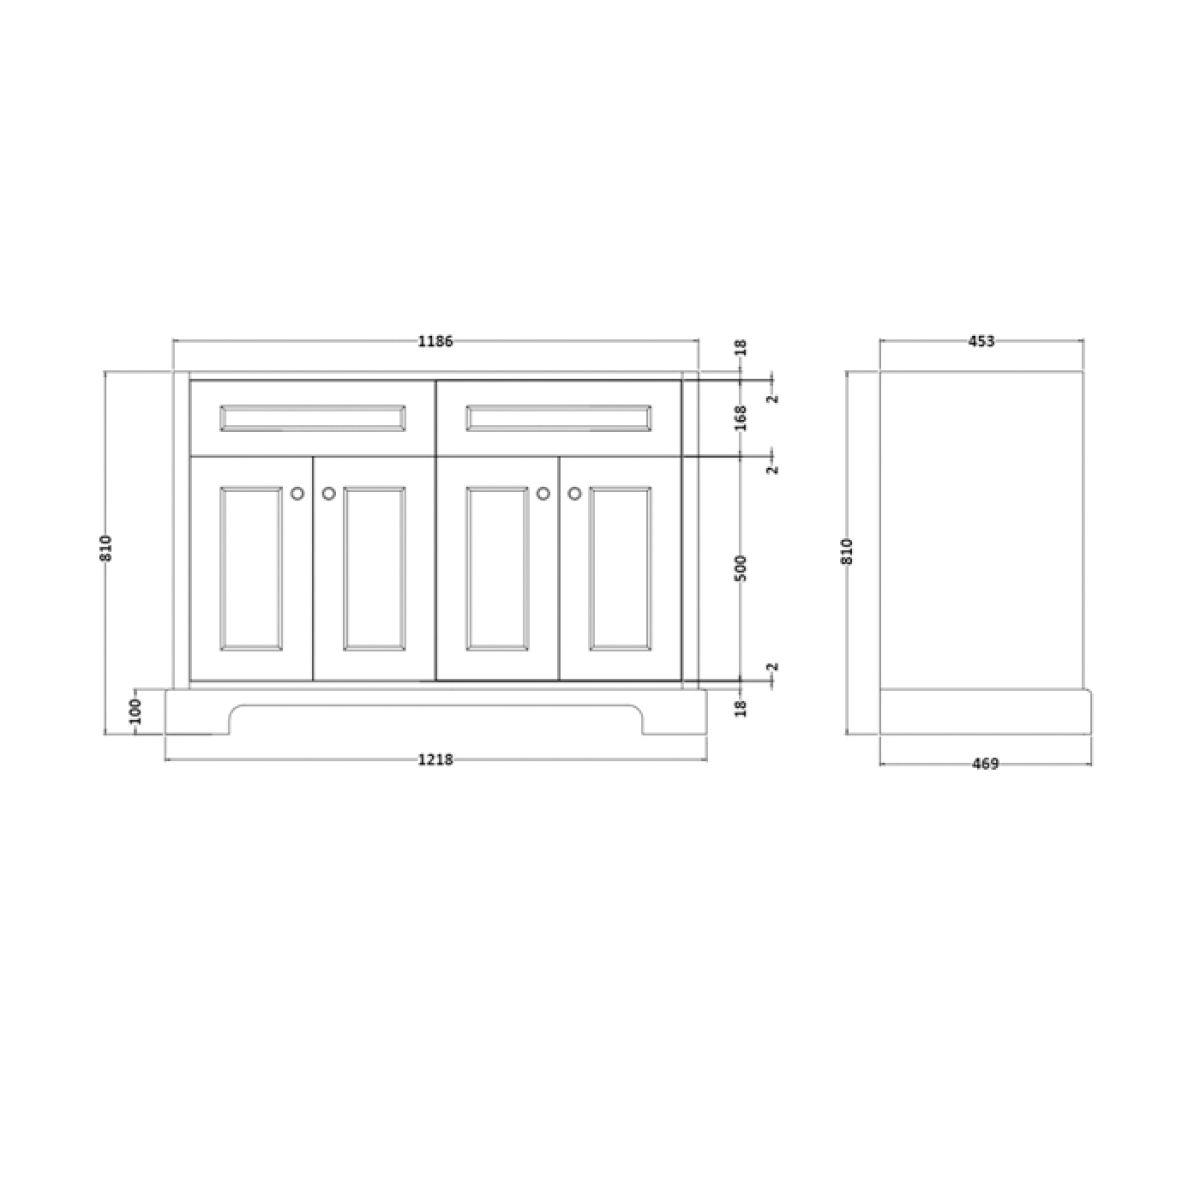 RAK Washington Greige Vanity Unit with Black Countertop 1200mm Measurements